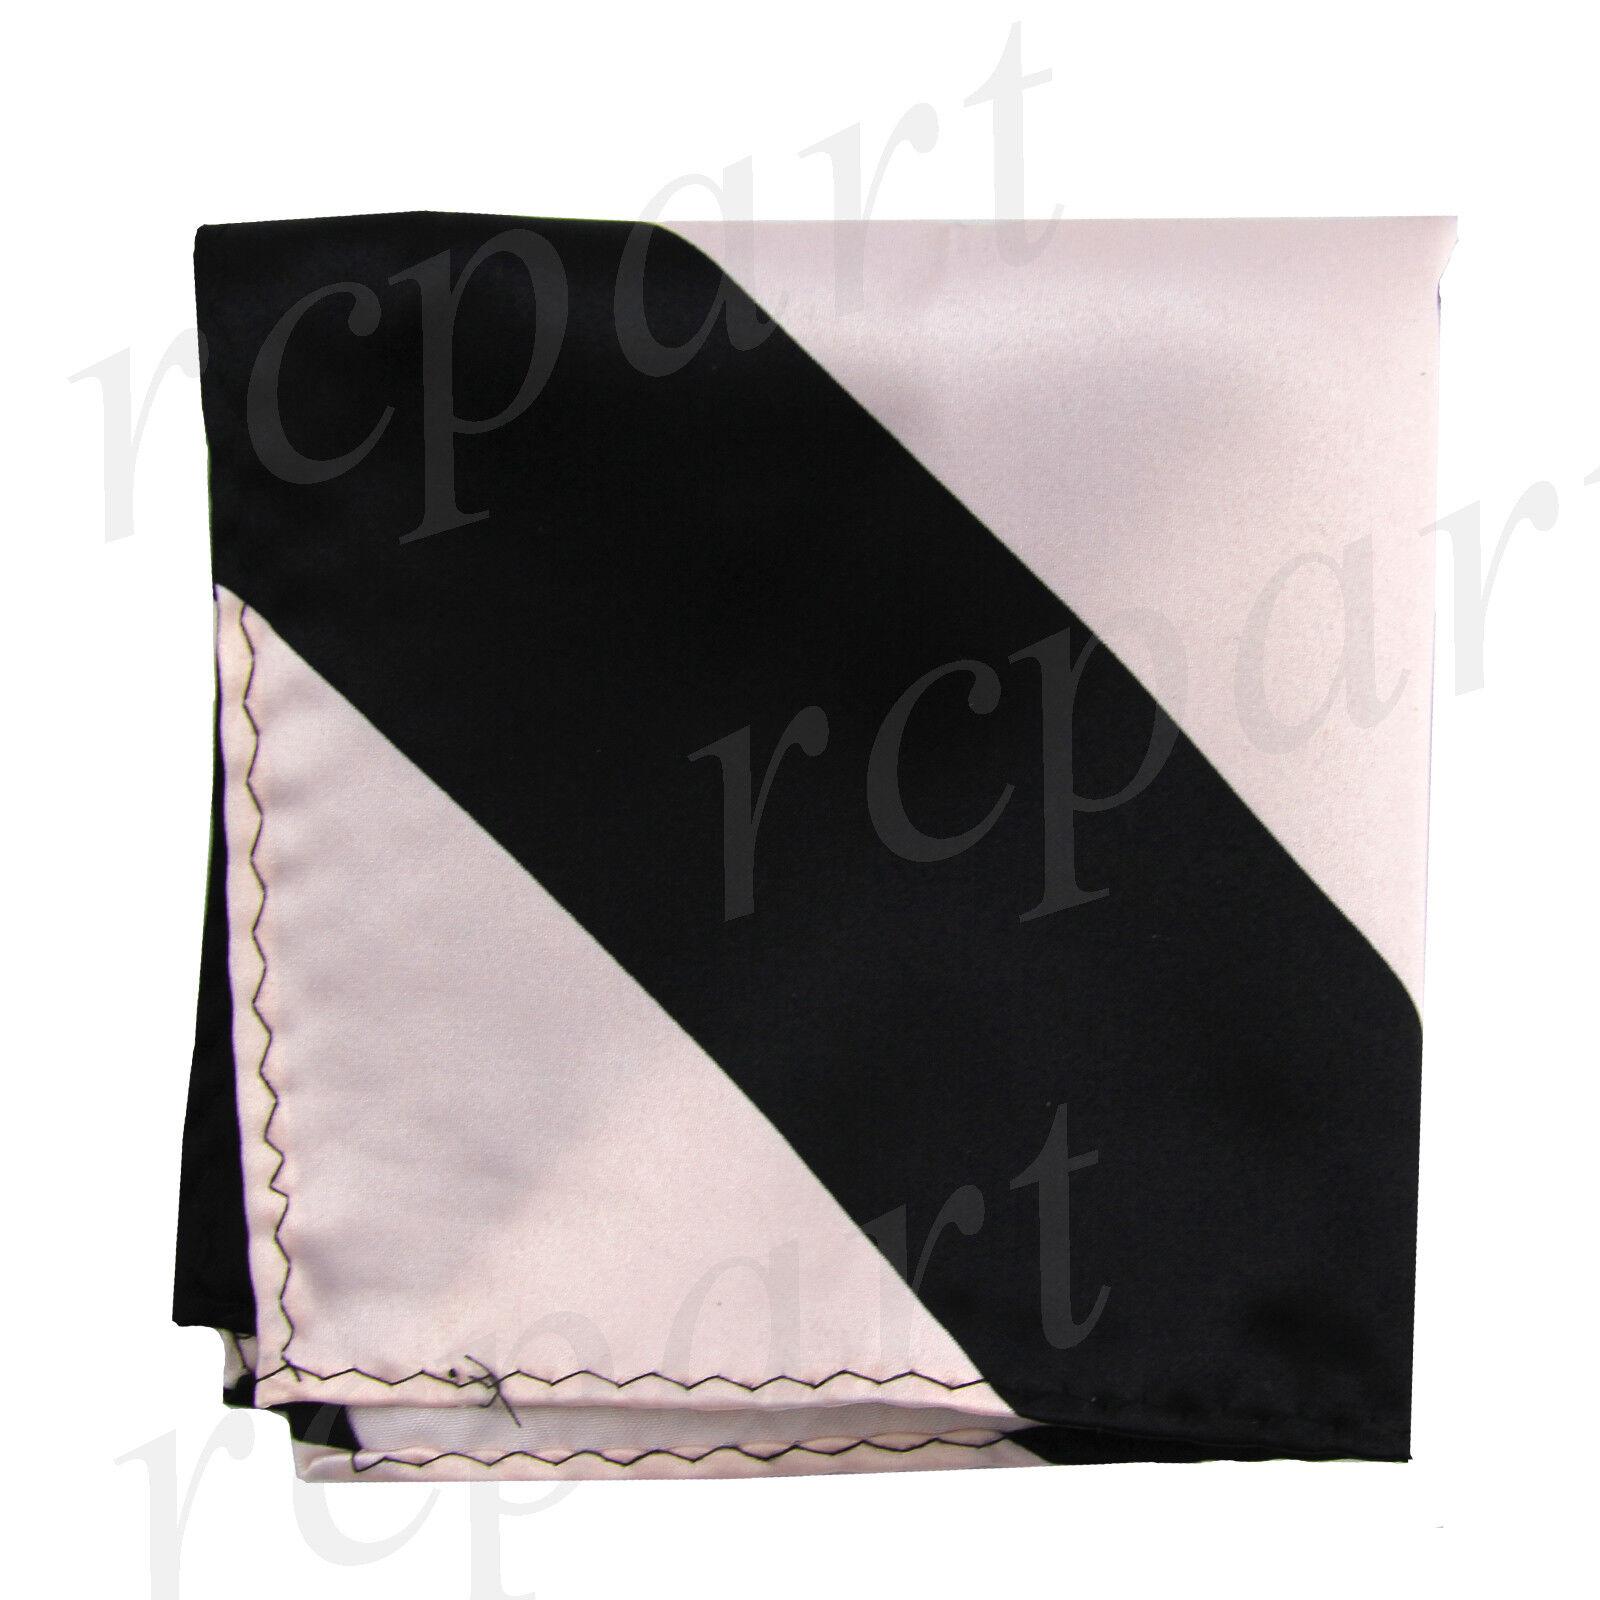 New men's polyester stripes pocket square hankie handkerchief pink black formal